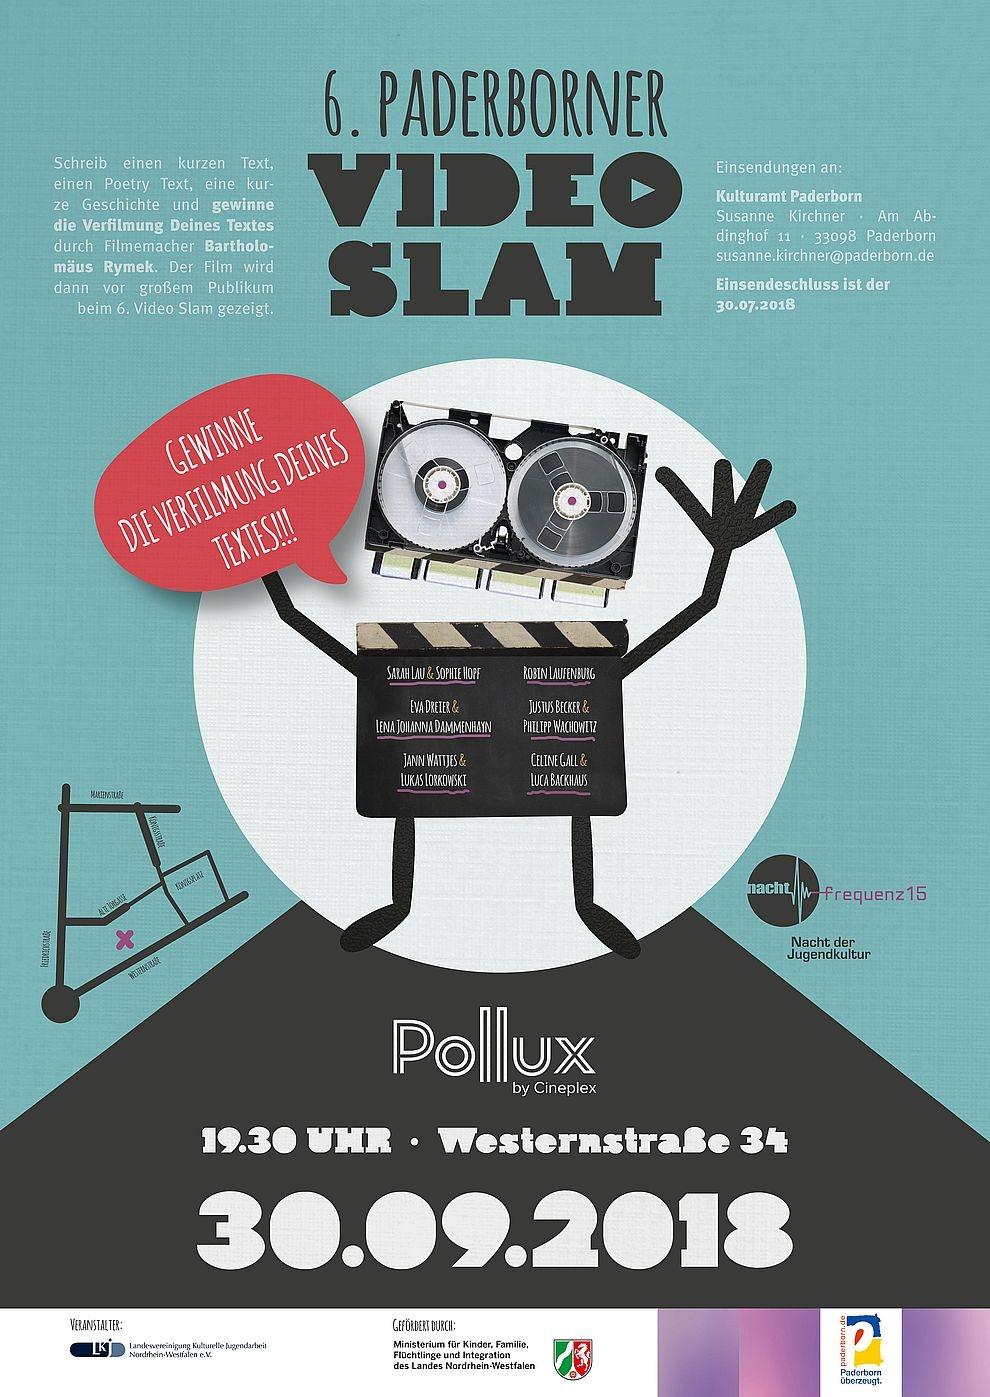 Paderborner Videoslam (Poster)